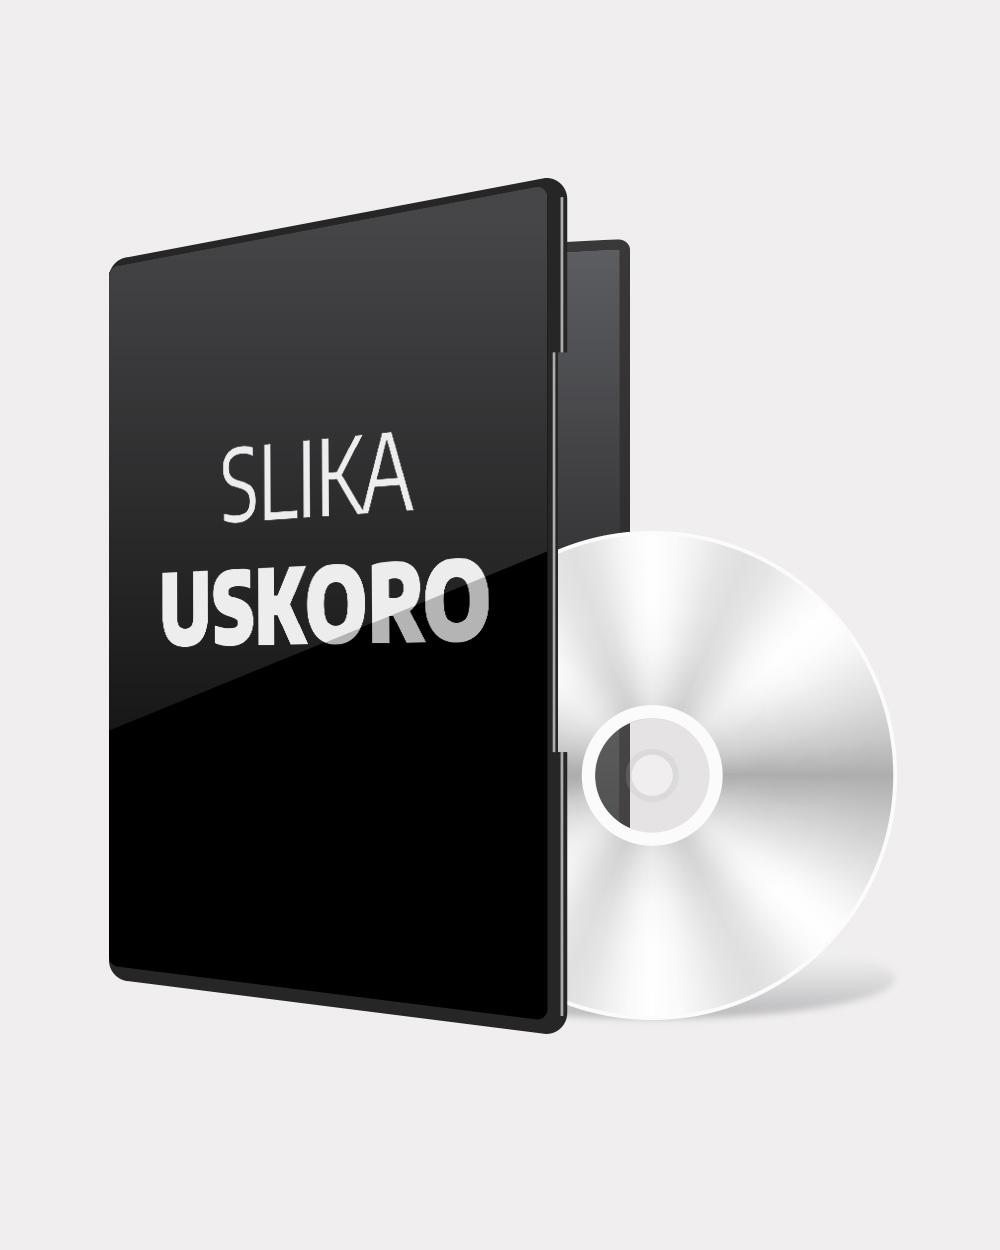 PCG Shellshock 2 - Blood Trails